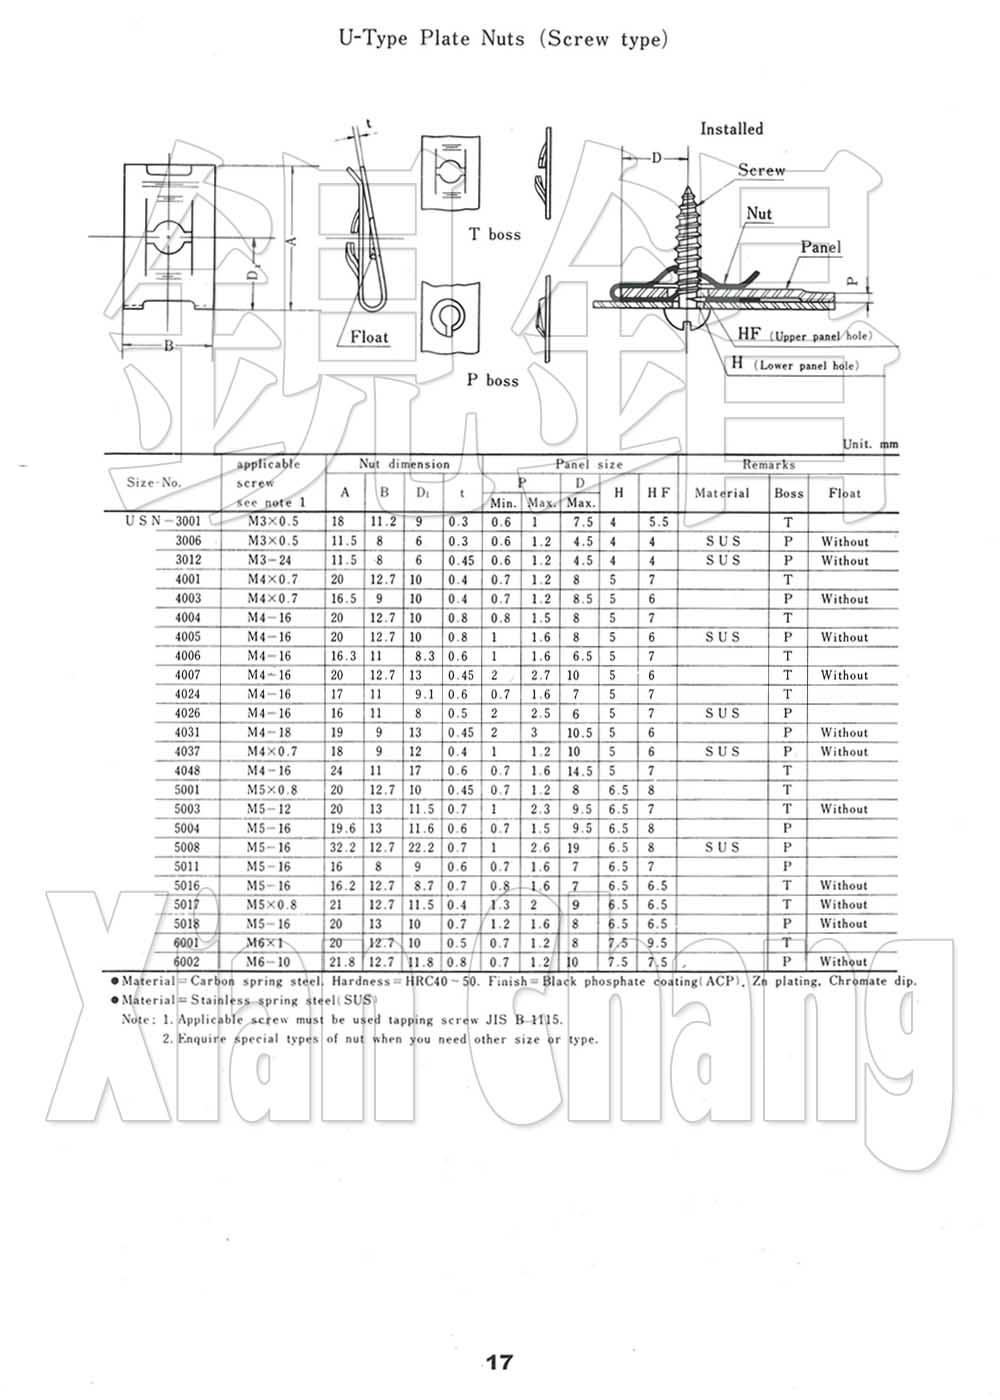 U-Type Plate Nuts (Screw Type) U型彈片,夾片螺帽 (螺釘型)